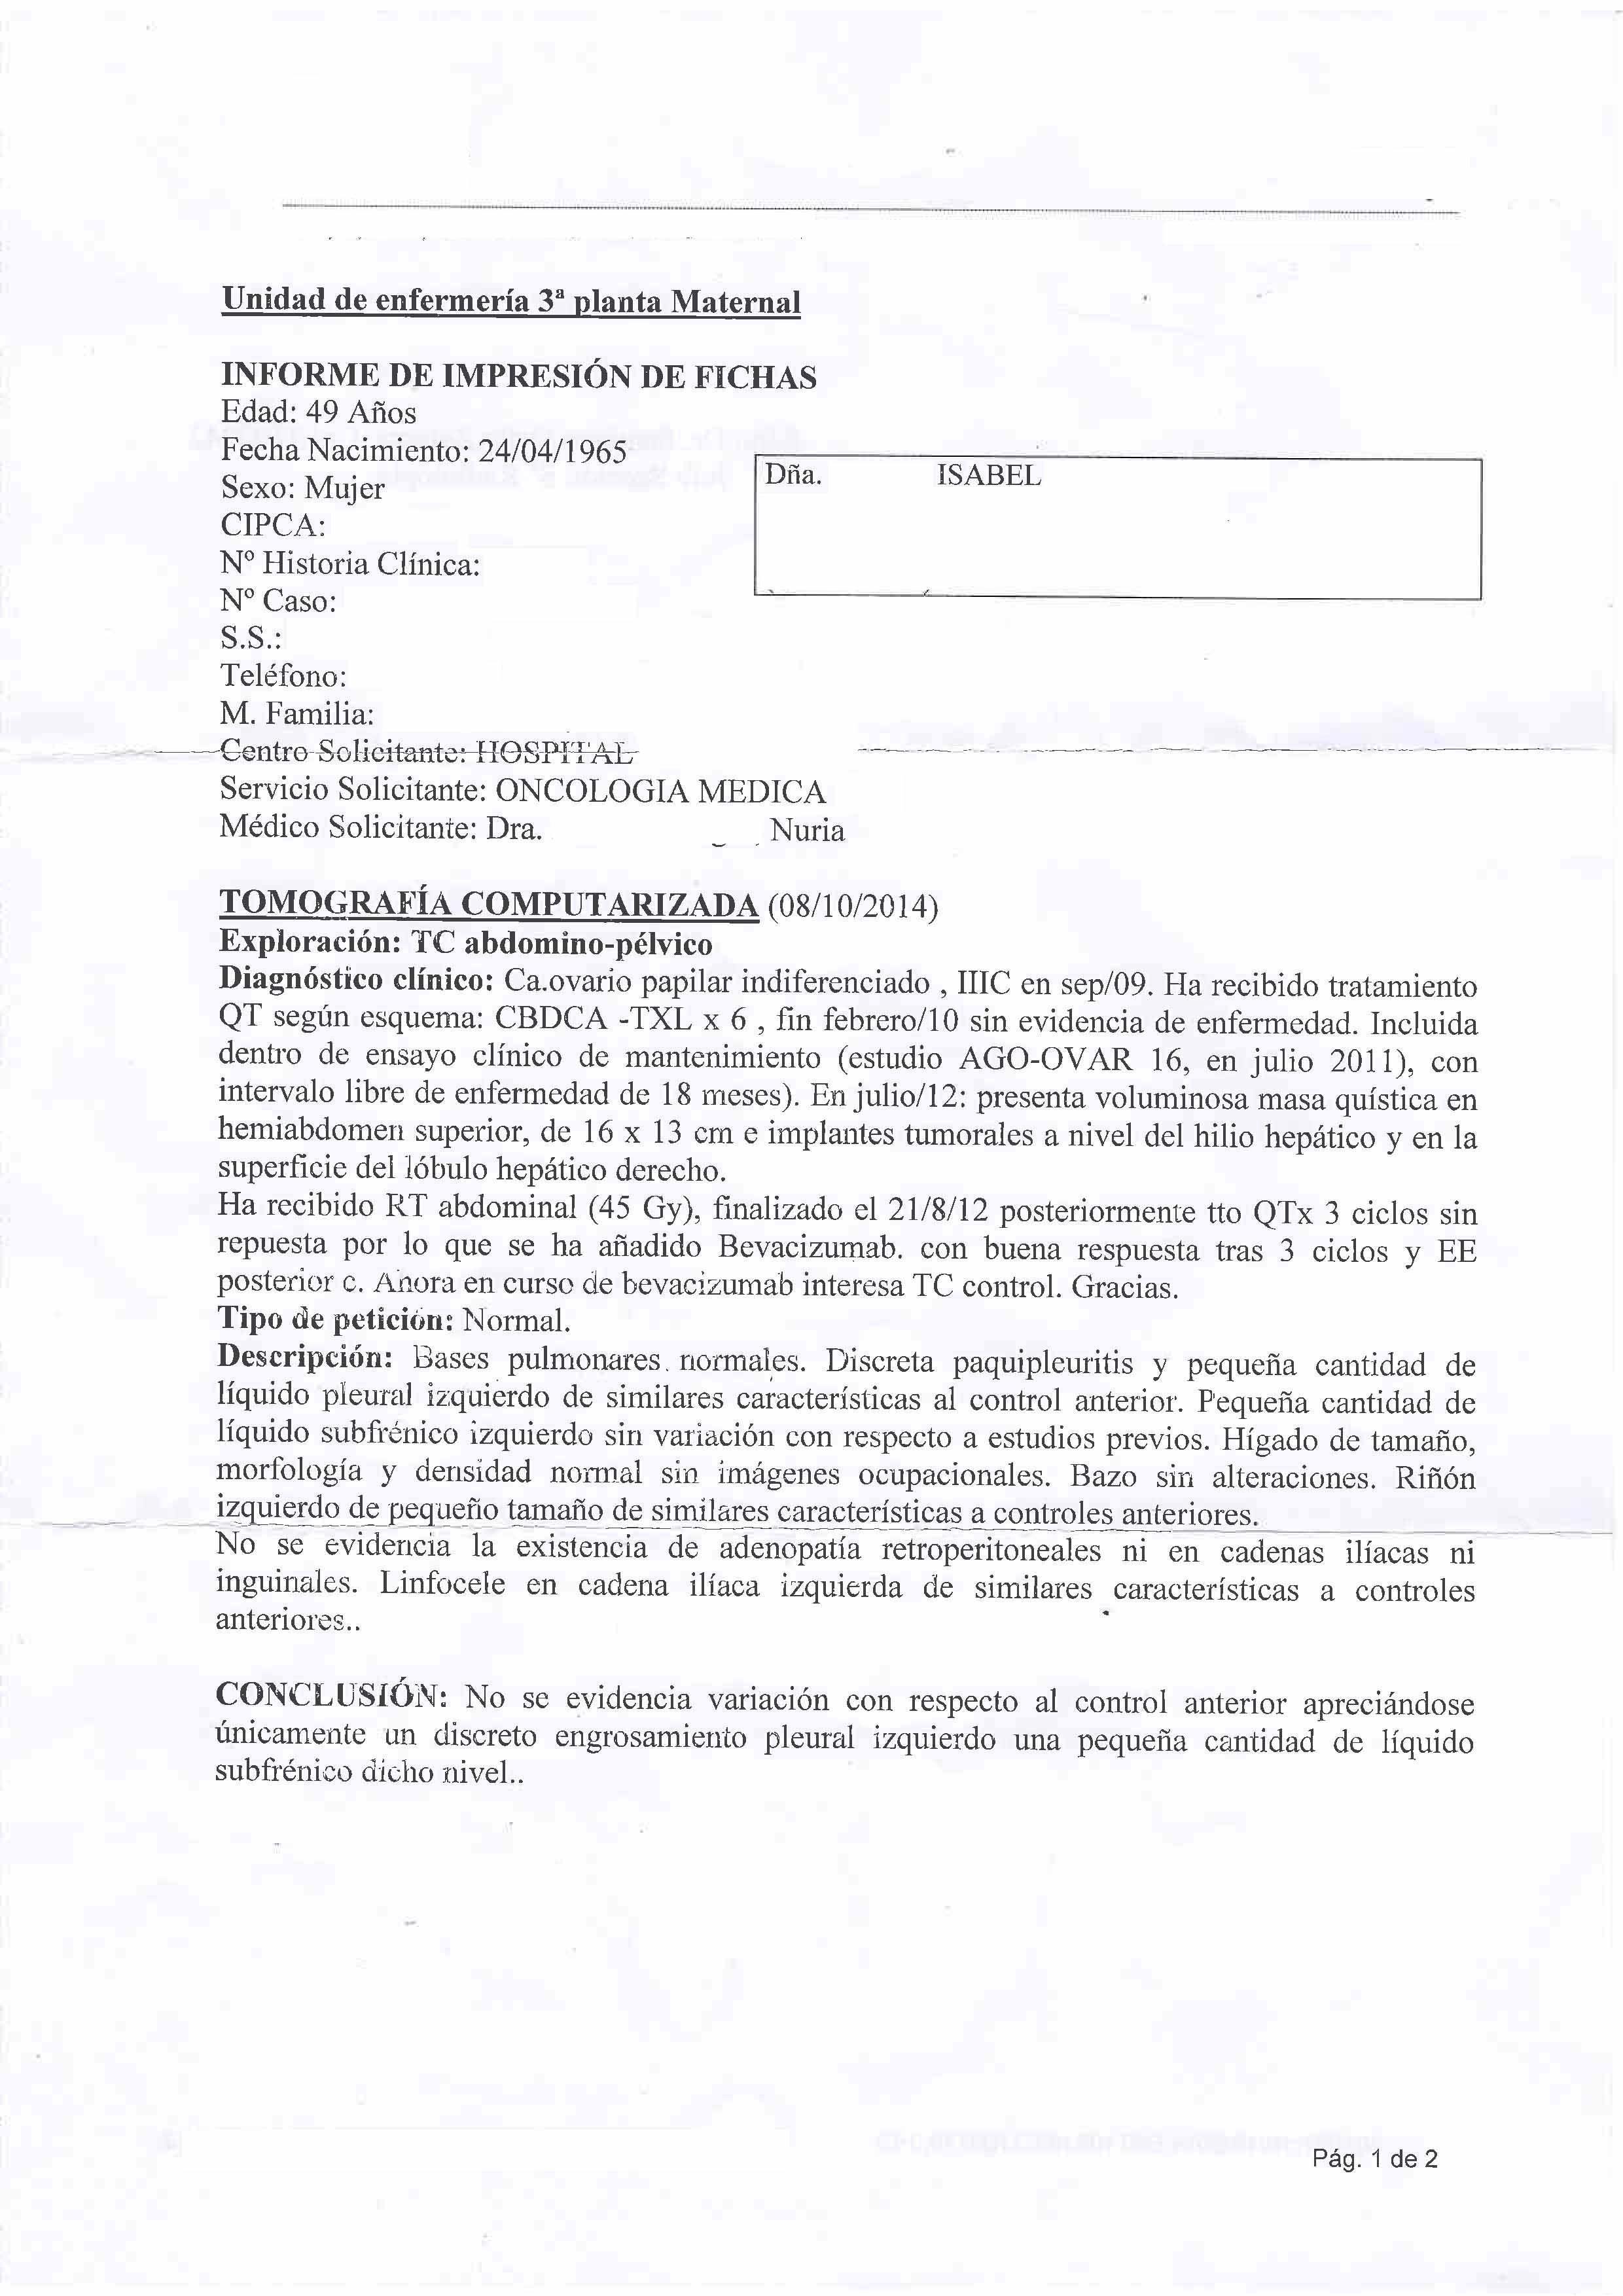 LifEscozul® - Isabel 3 - Cáncer de Ovarios